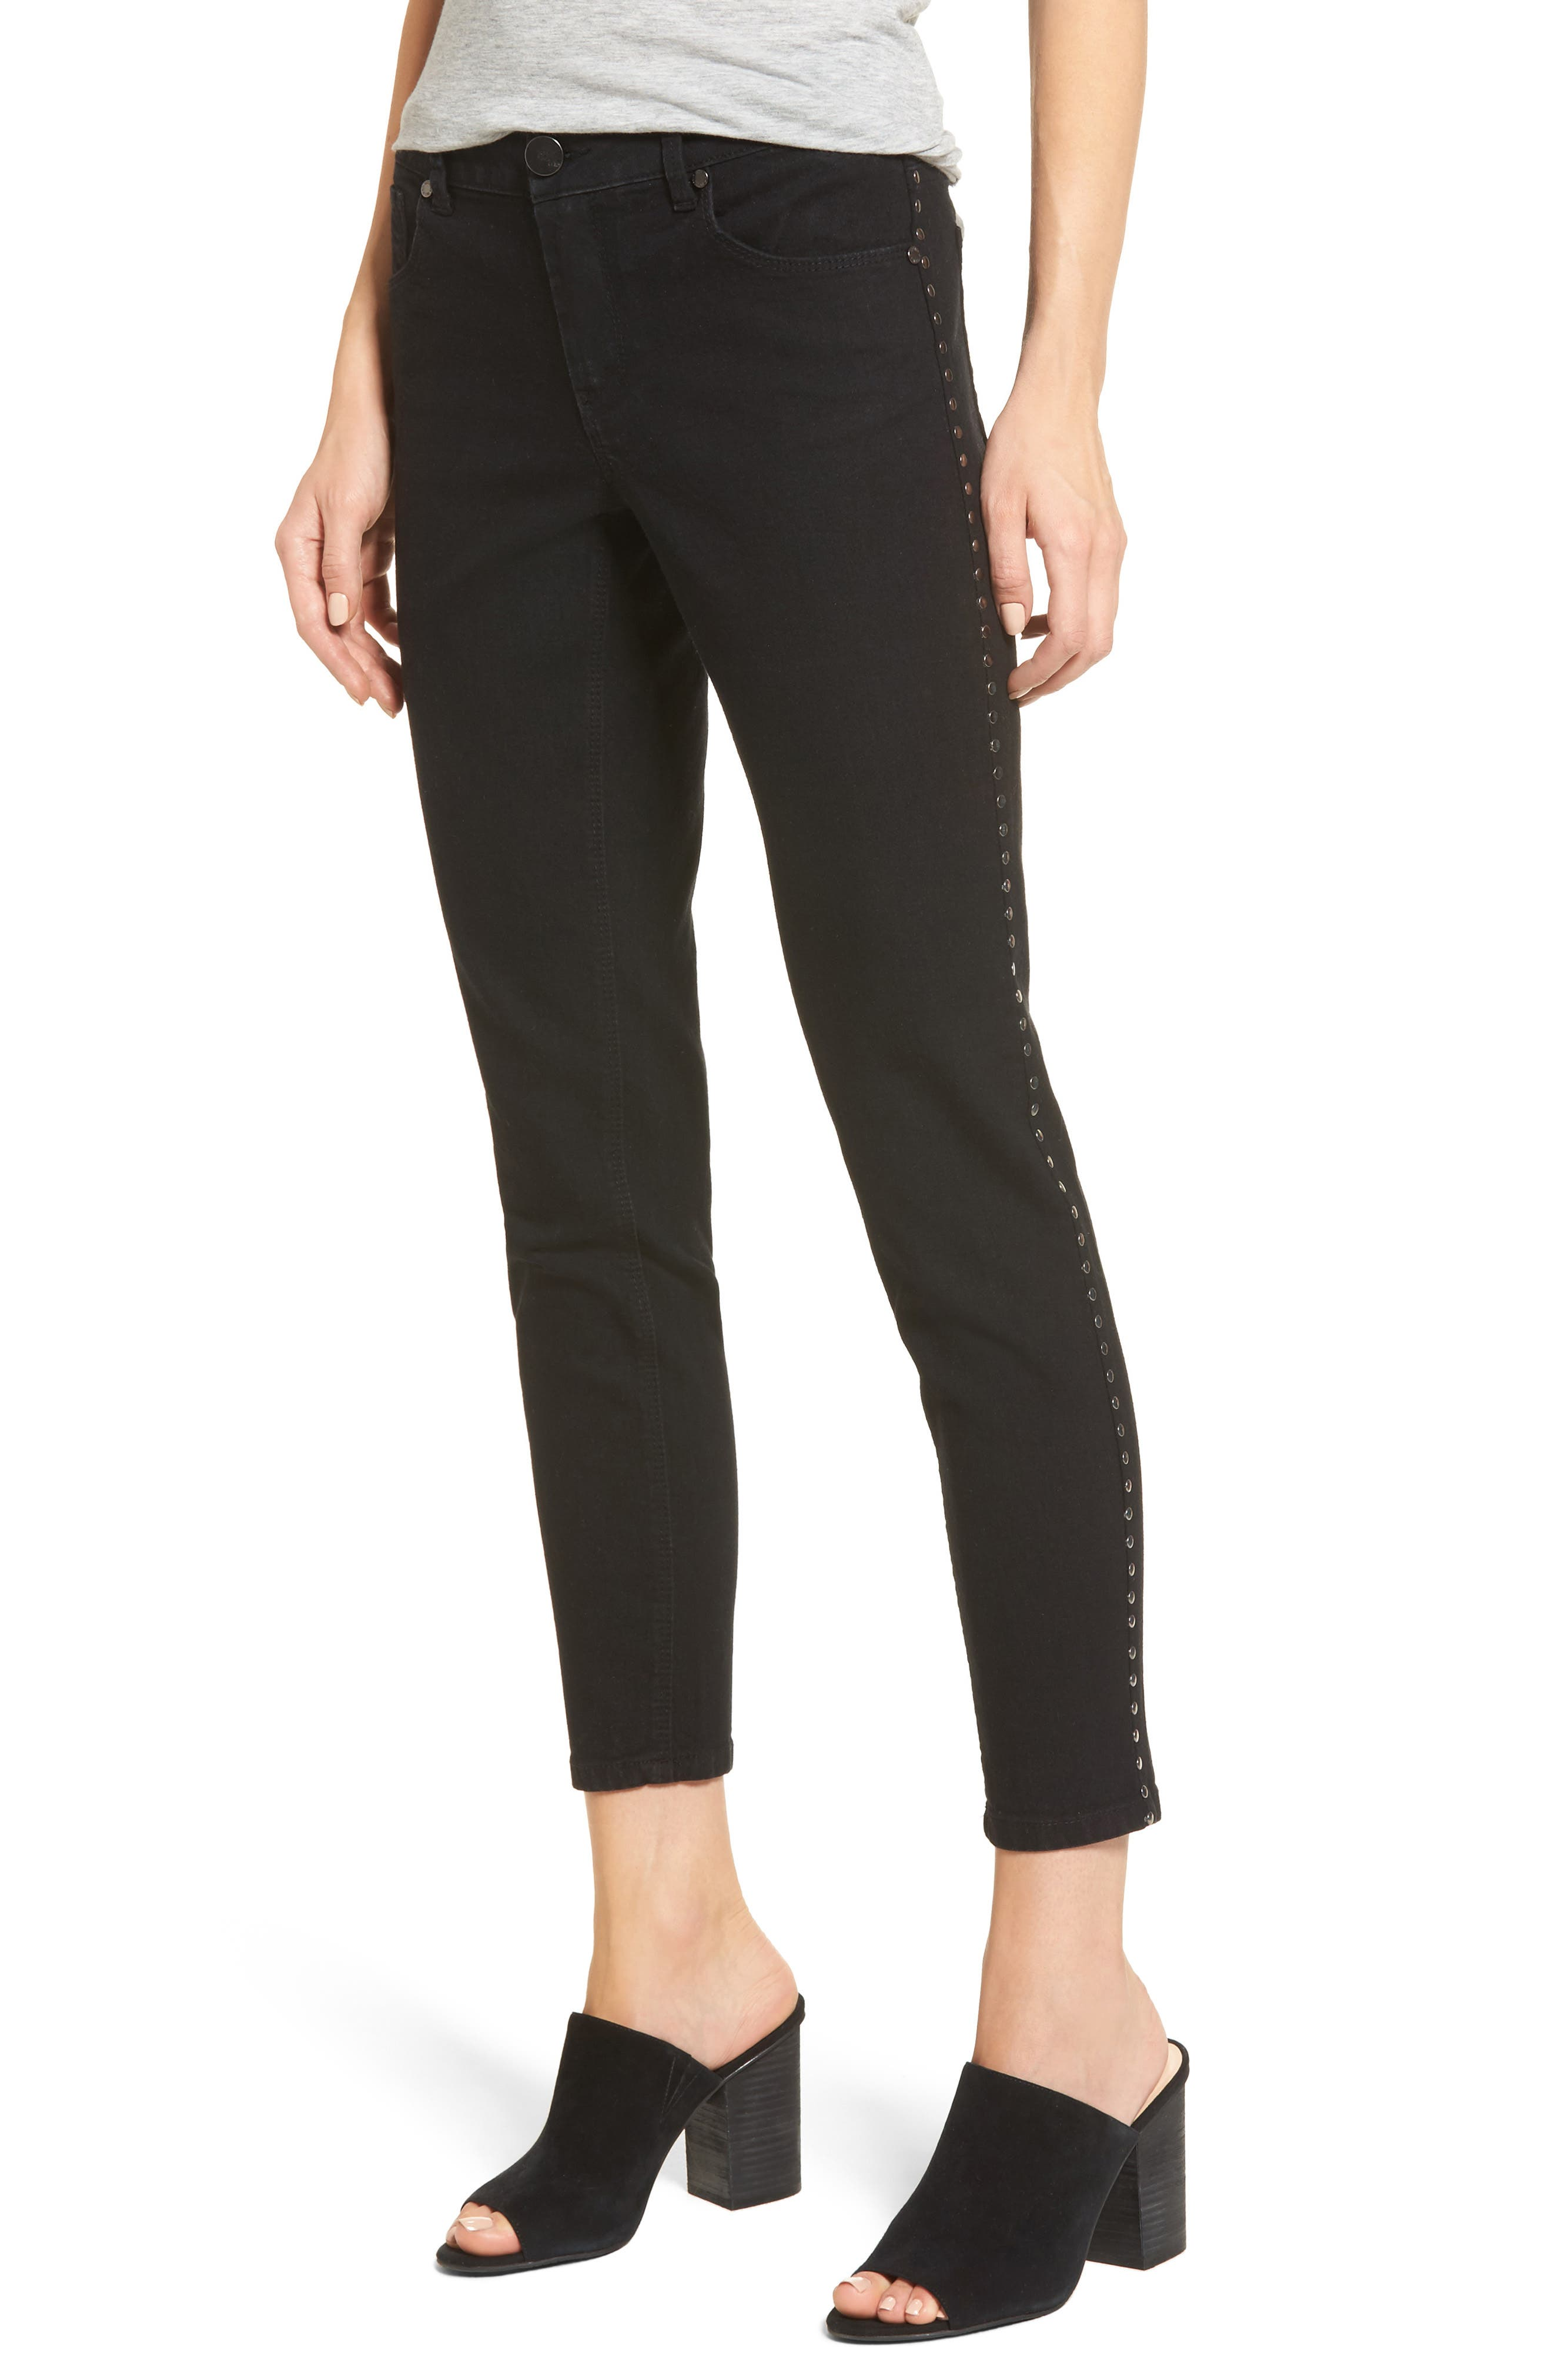 Alternate Image 1 Selected - 1822 Denim Studded Skinny Jeans